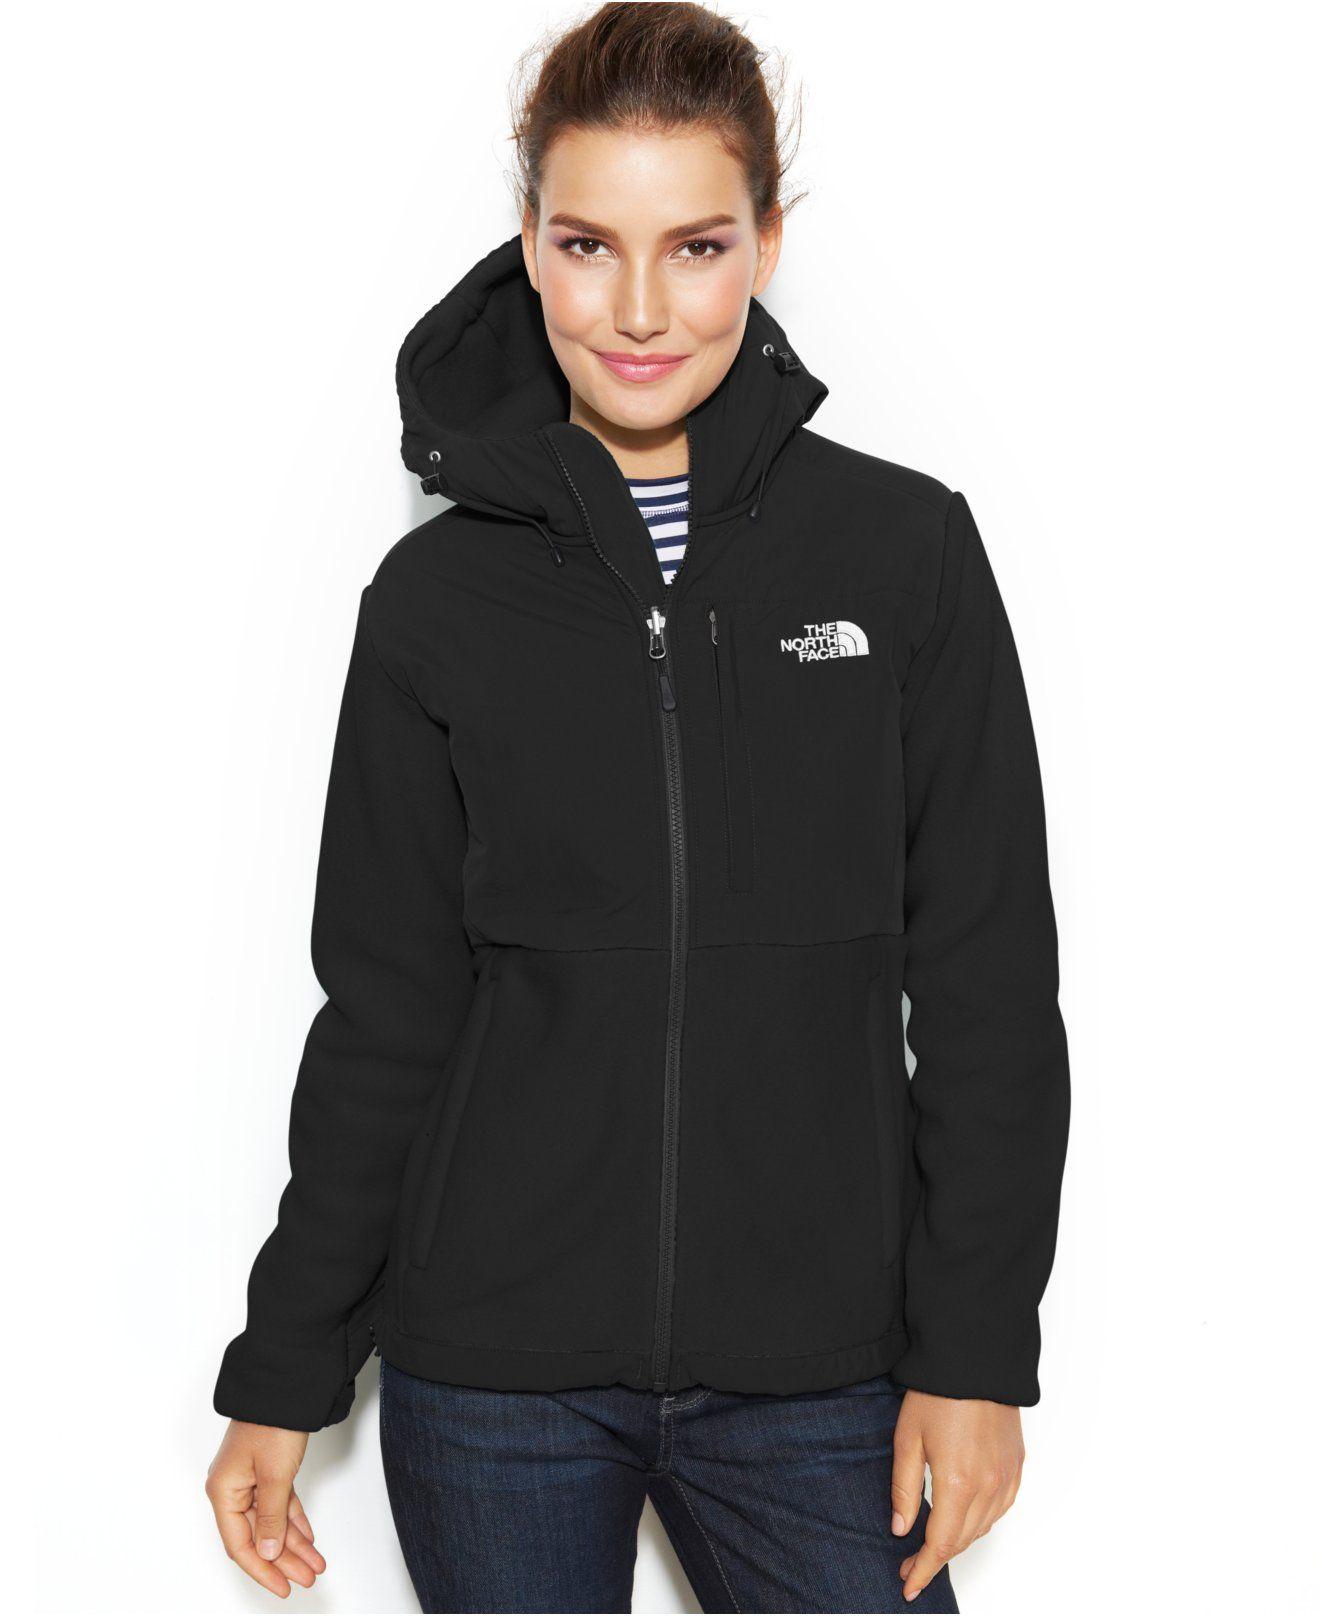 The North Face Hooded Denali Fleece Jacket Reviews Jackets Blazers Women Macy S Blazer Jackets For Women Fleece Jacket The North Face [ 1616 x 1320 Pixel ]